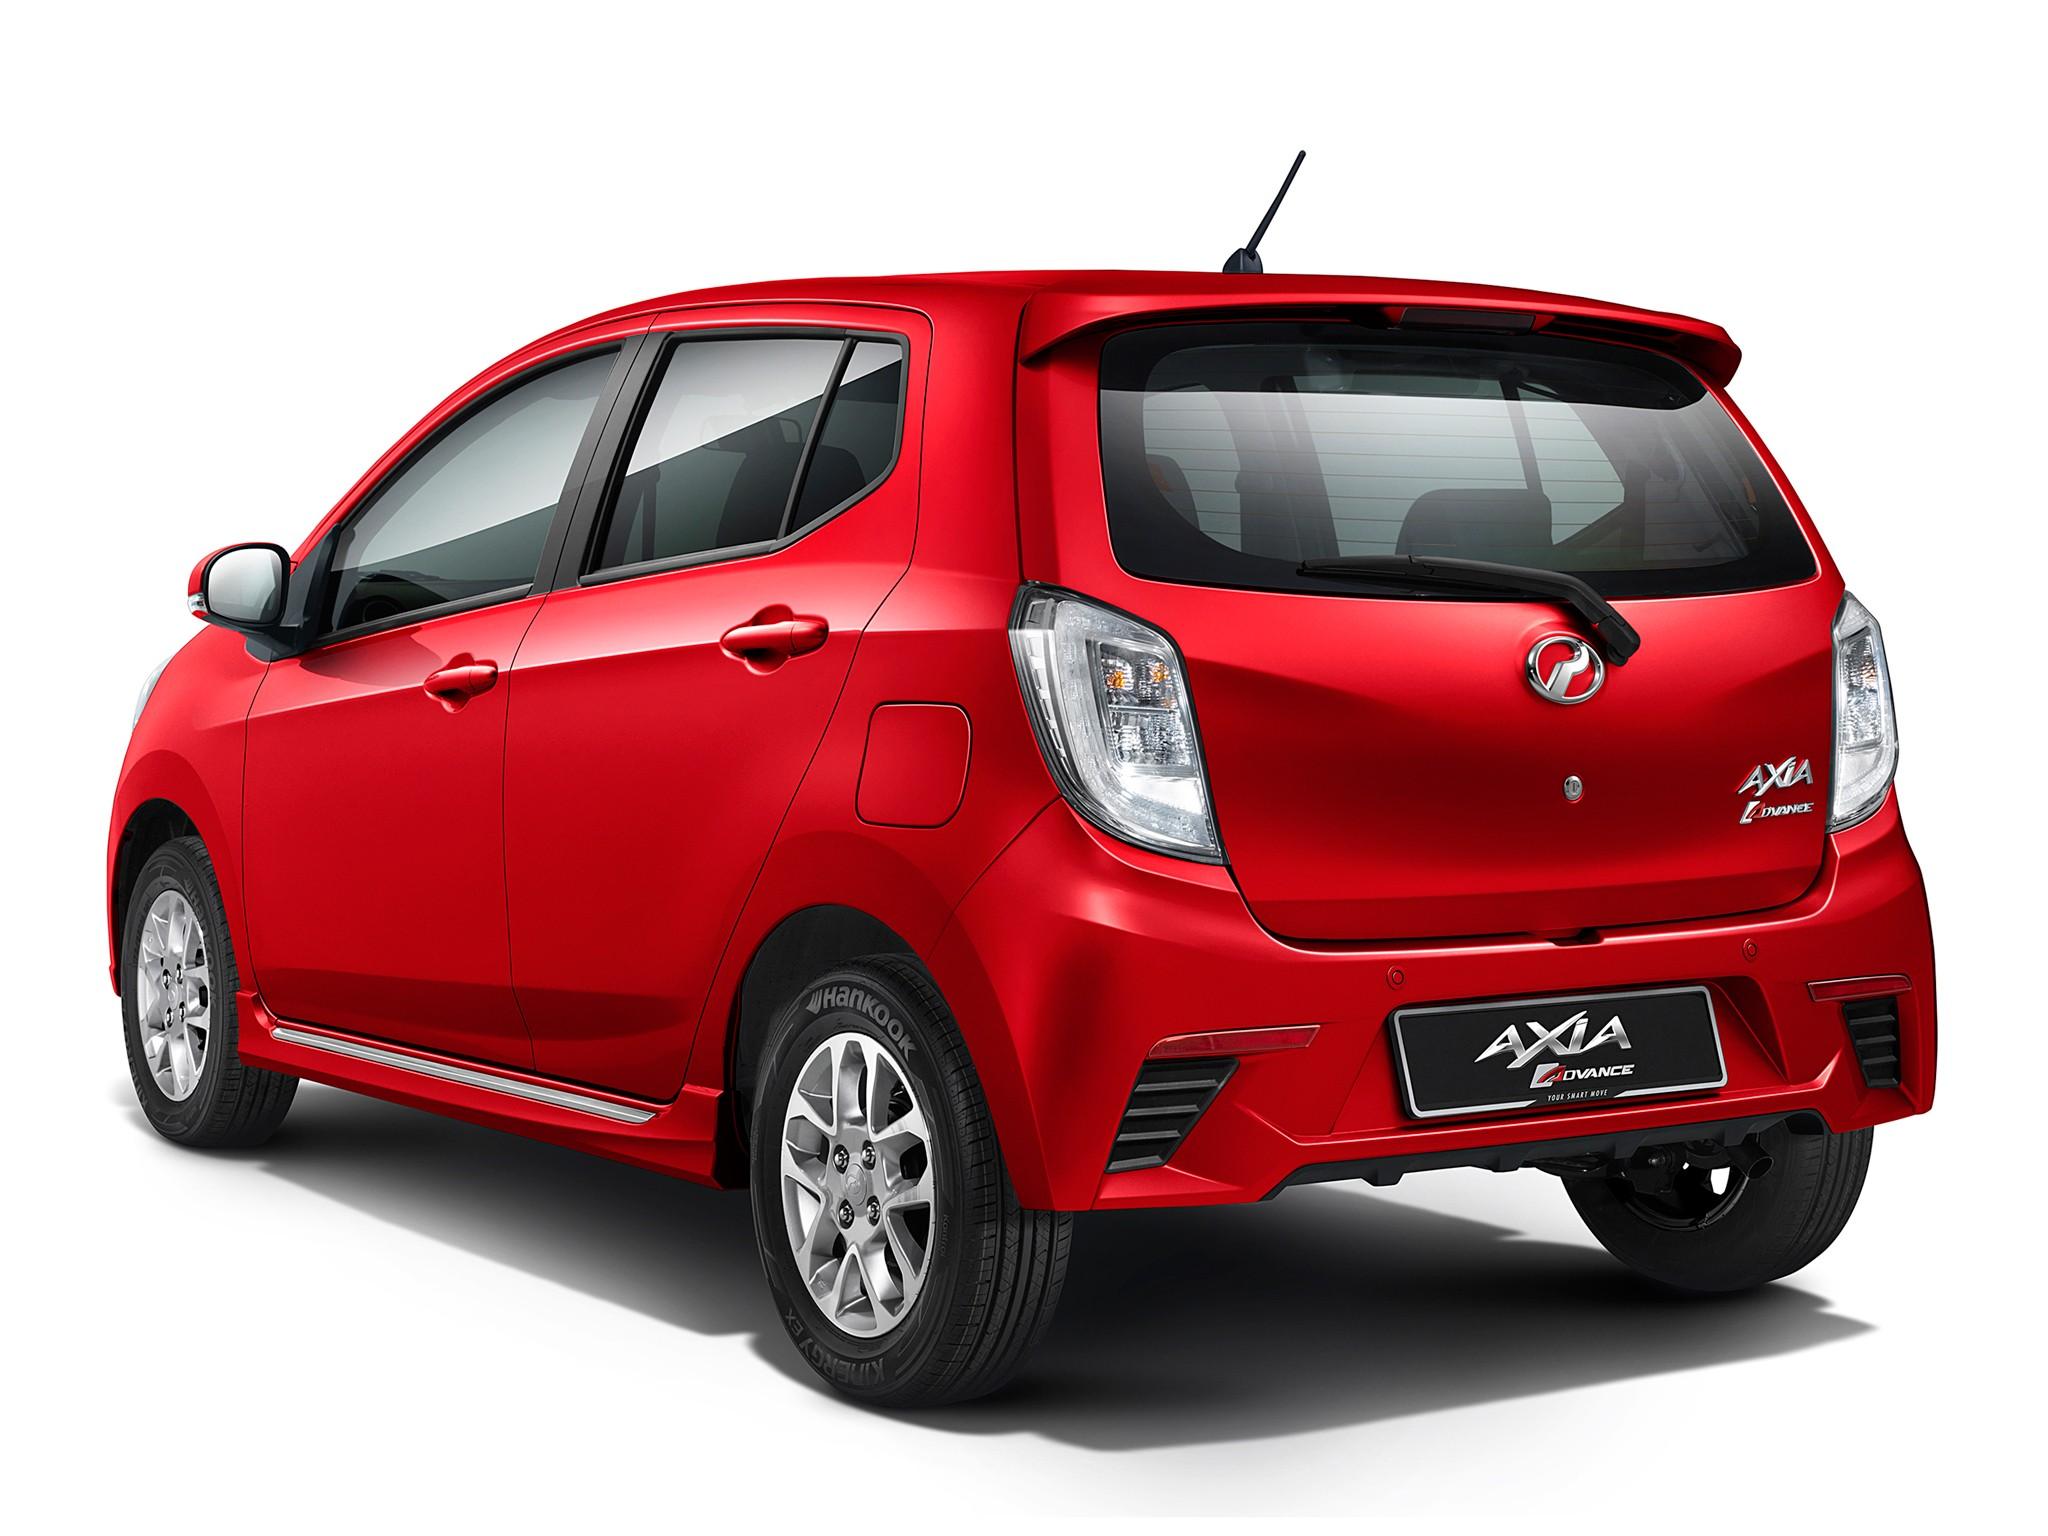 Perodua Axia 2014 2015 2016 Autoevolution